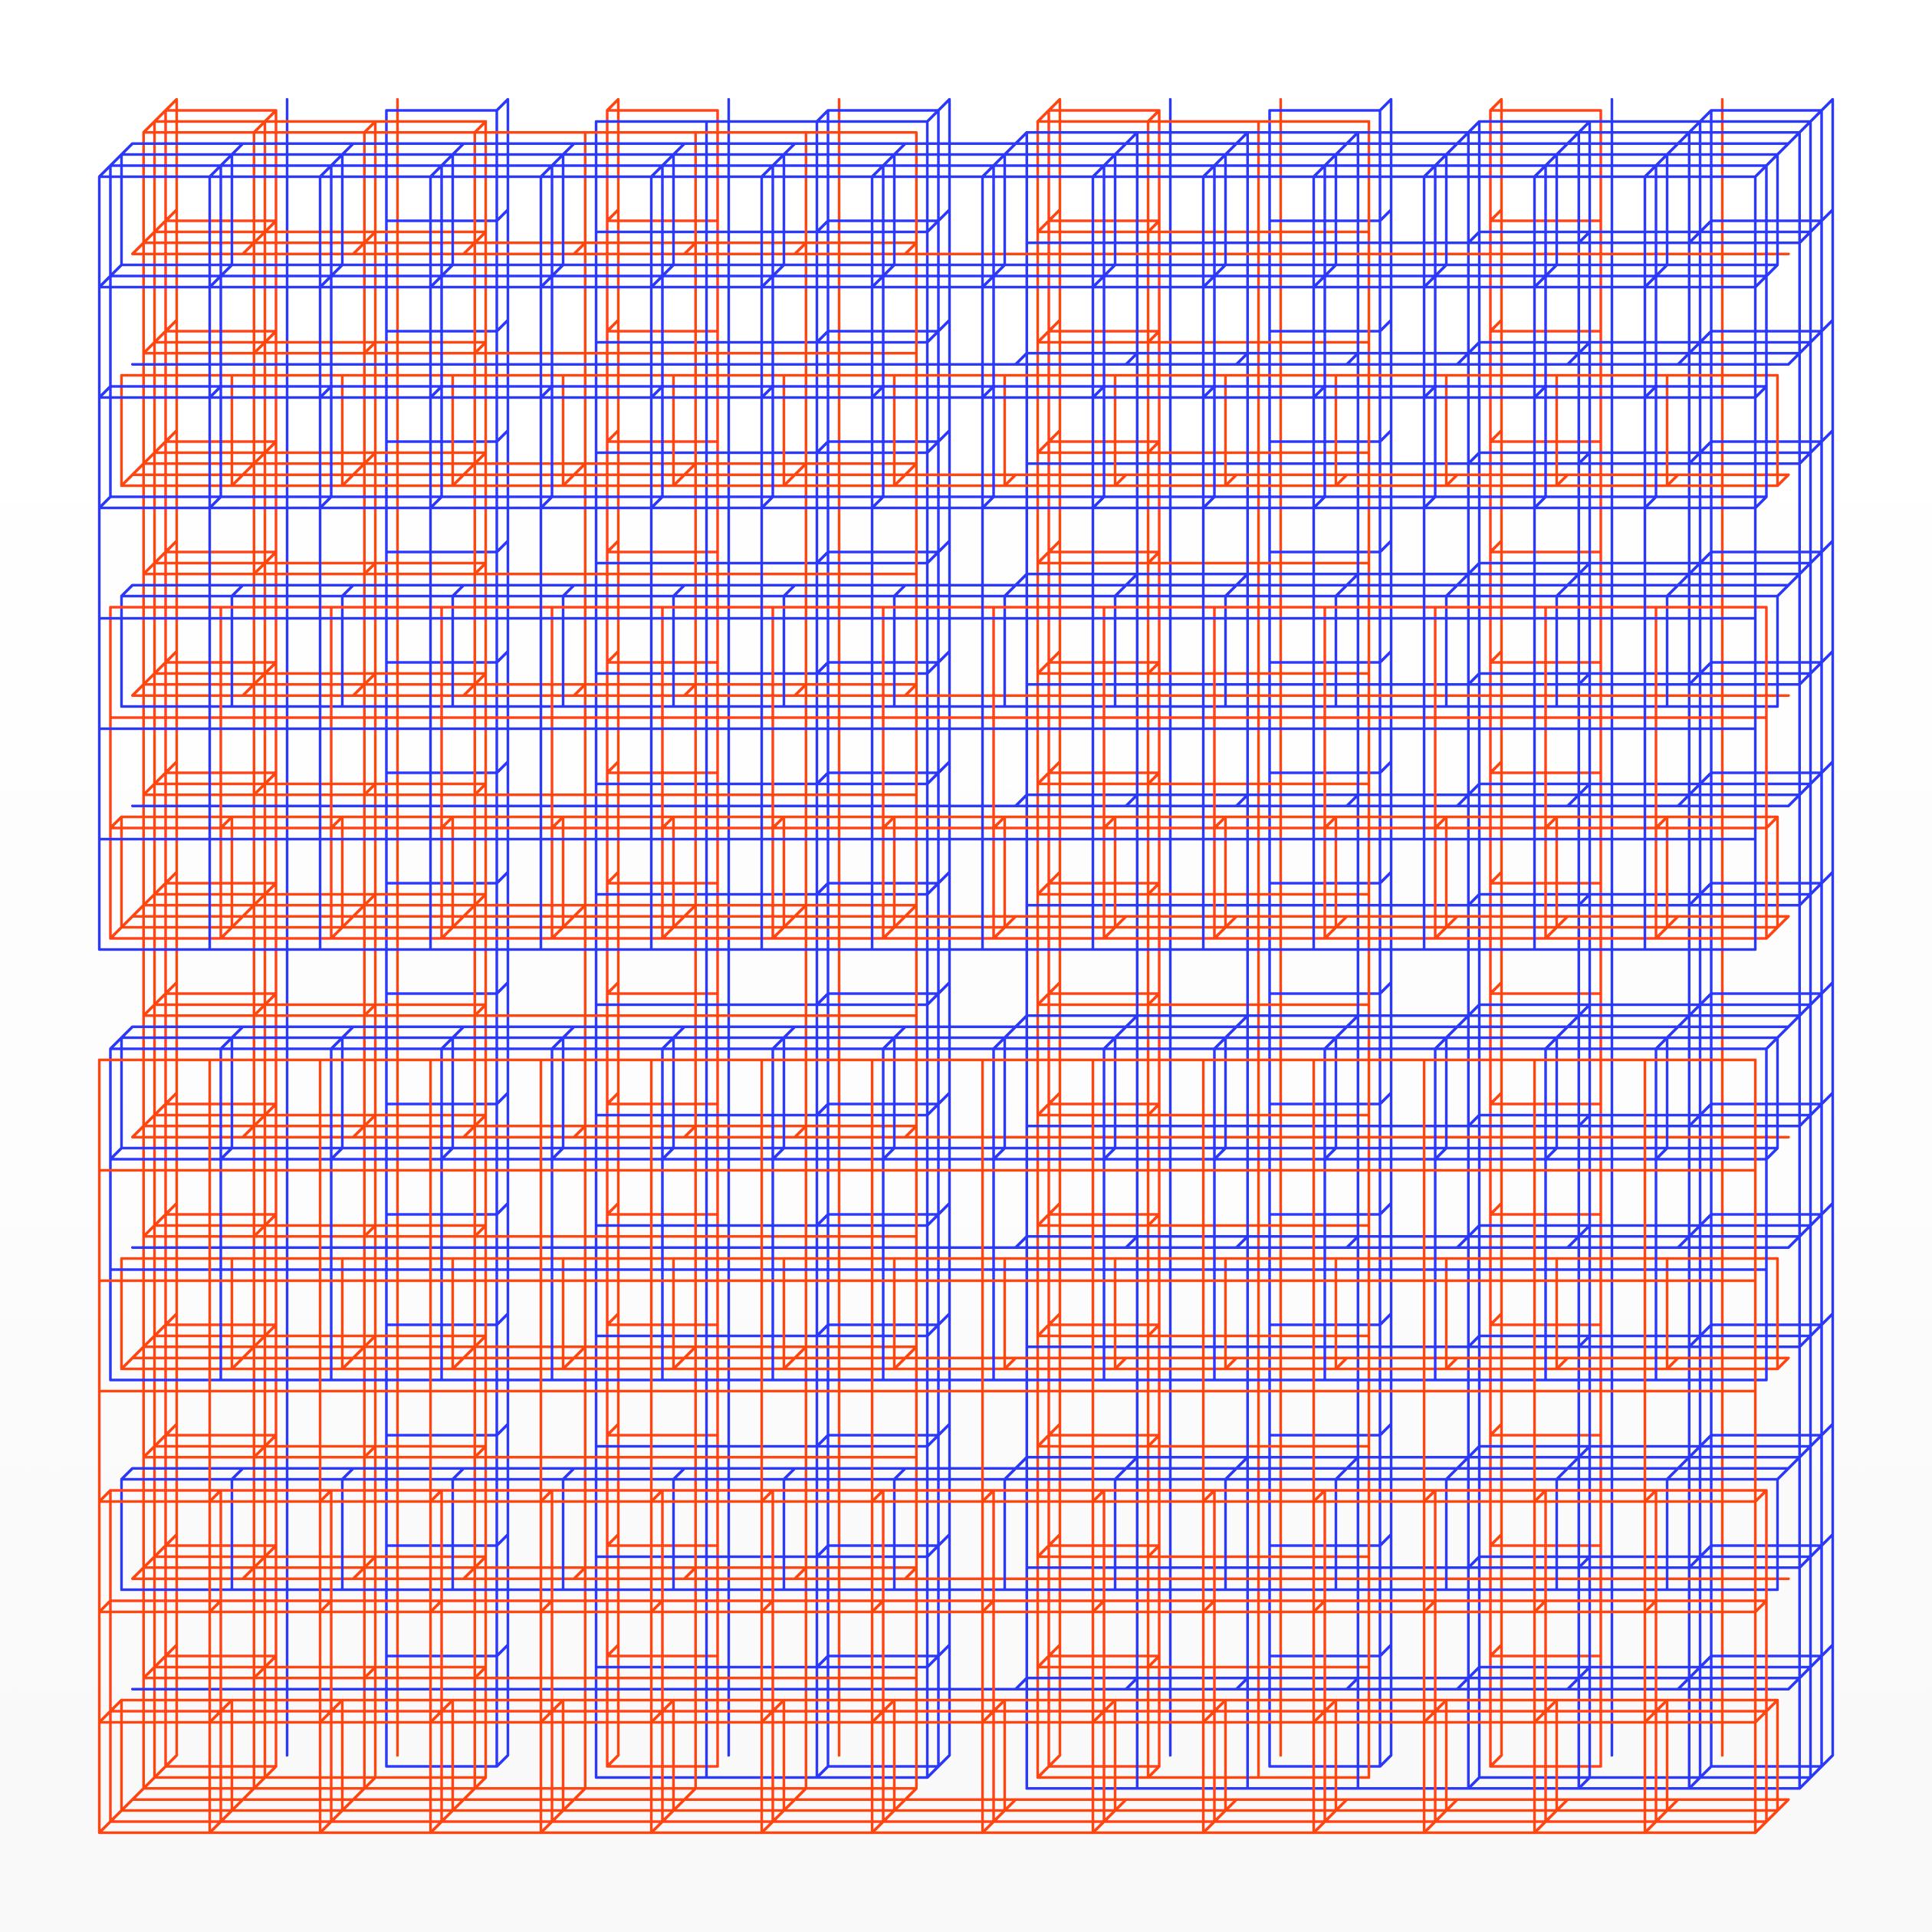 grid_16_all_20180430